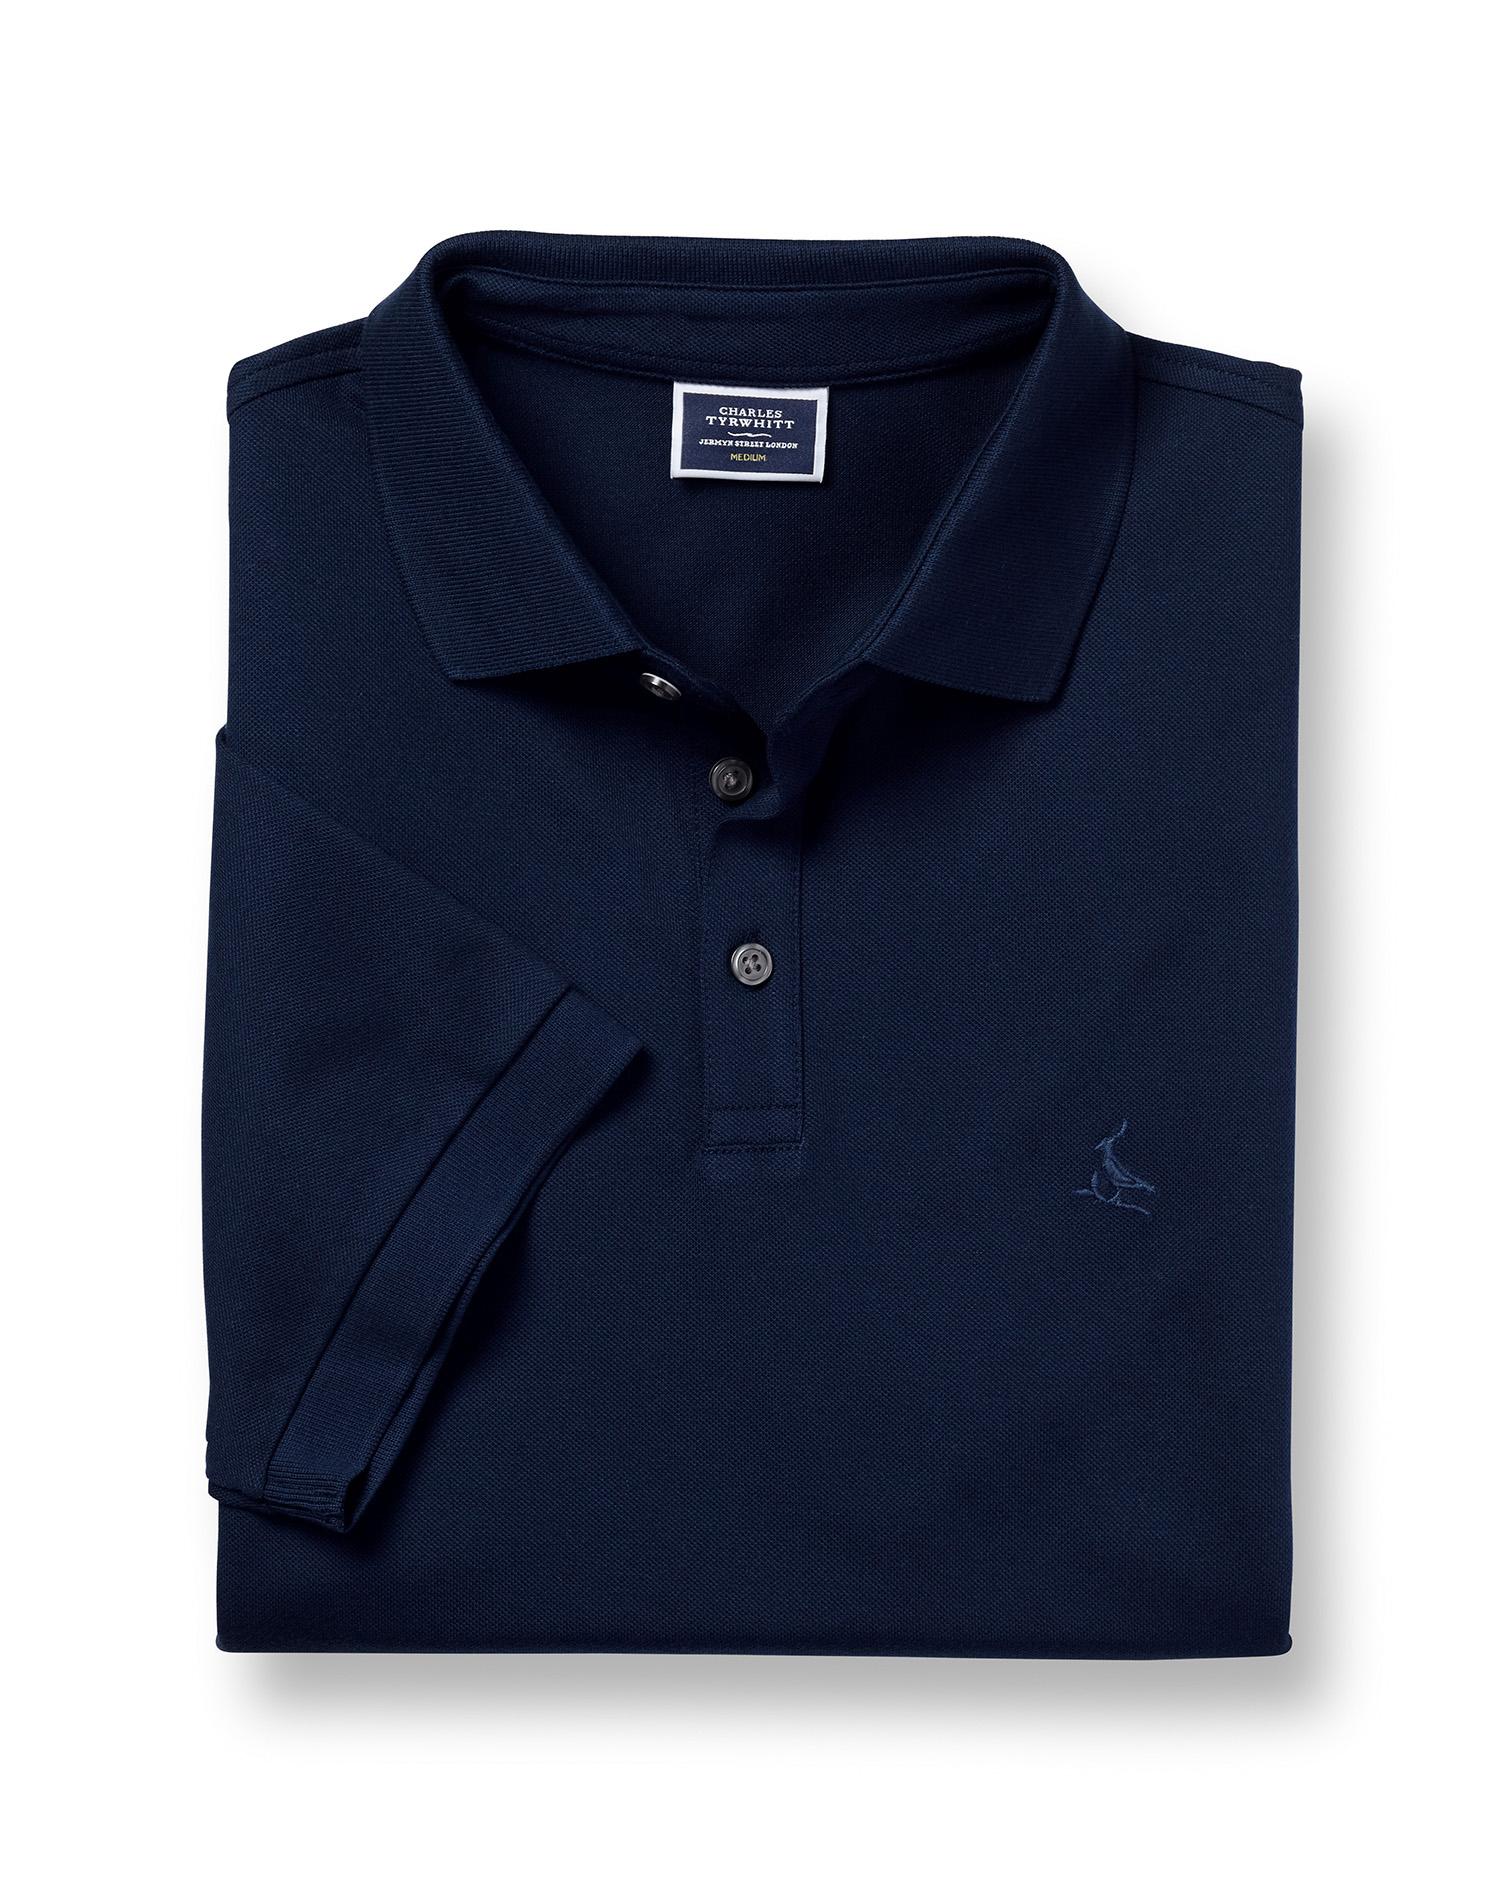 Polo Tyrwhitt En Piqué - Bleu Marine - XXXL par Charles Tyrwhitt